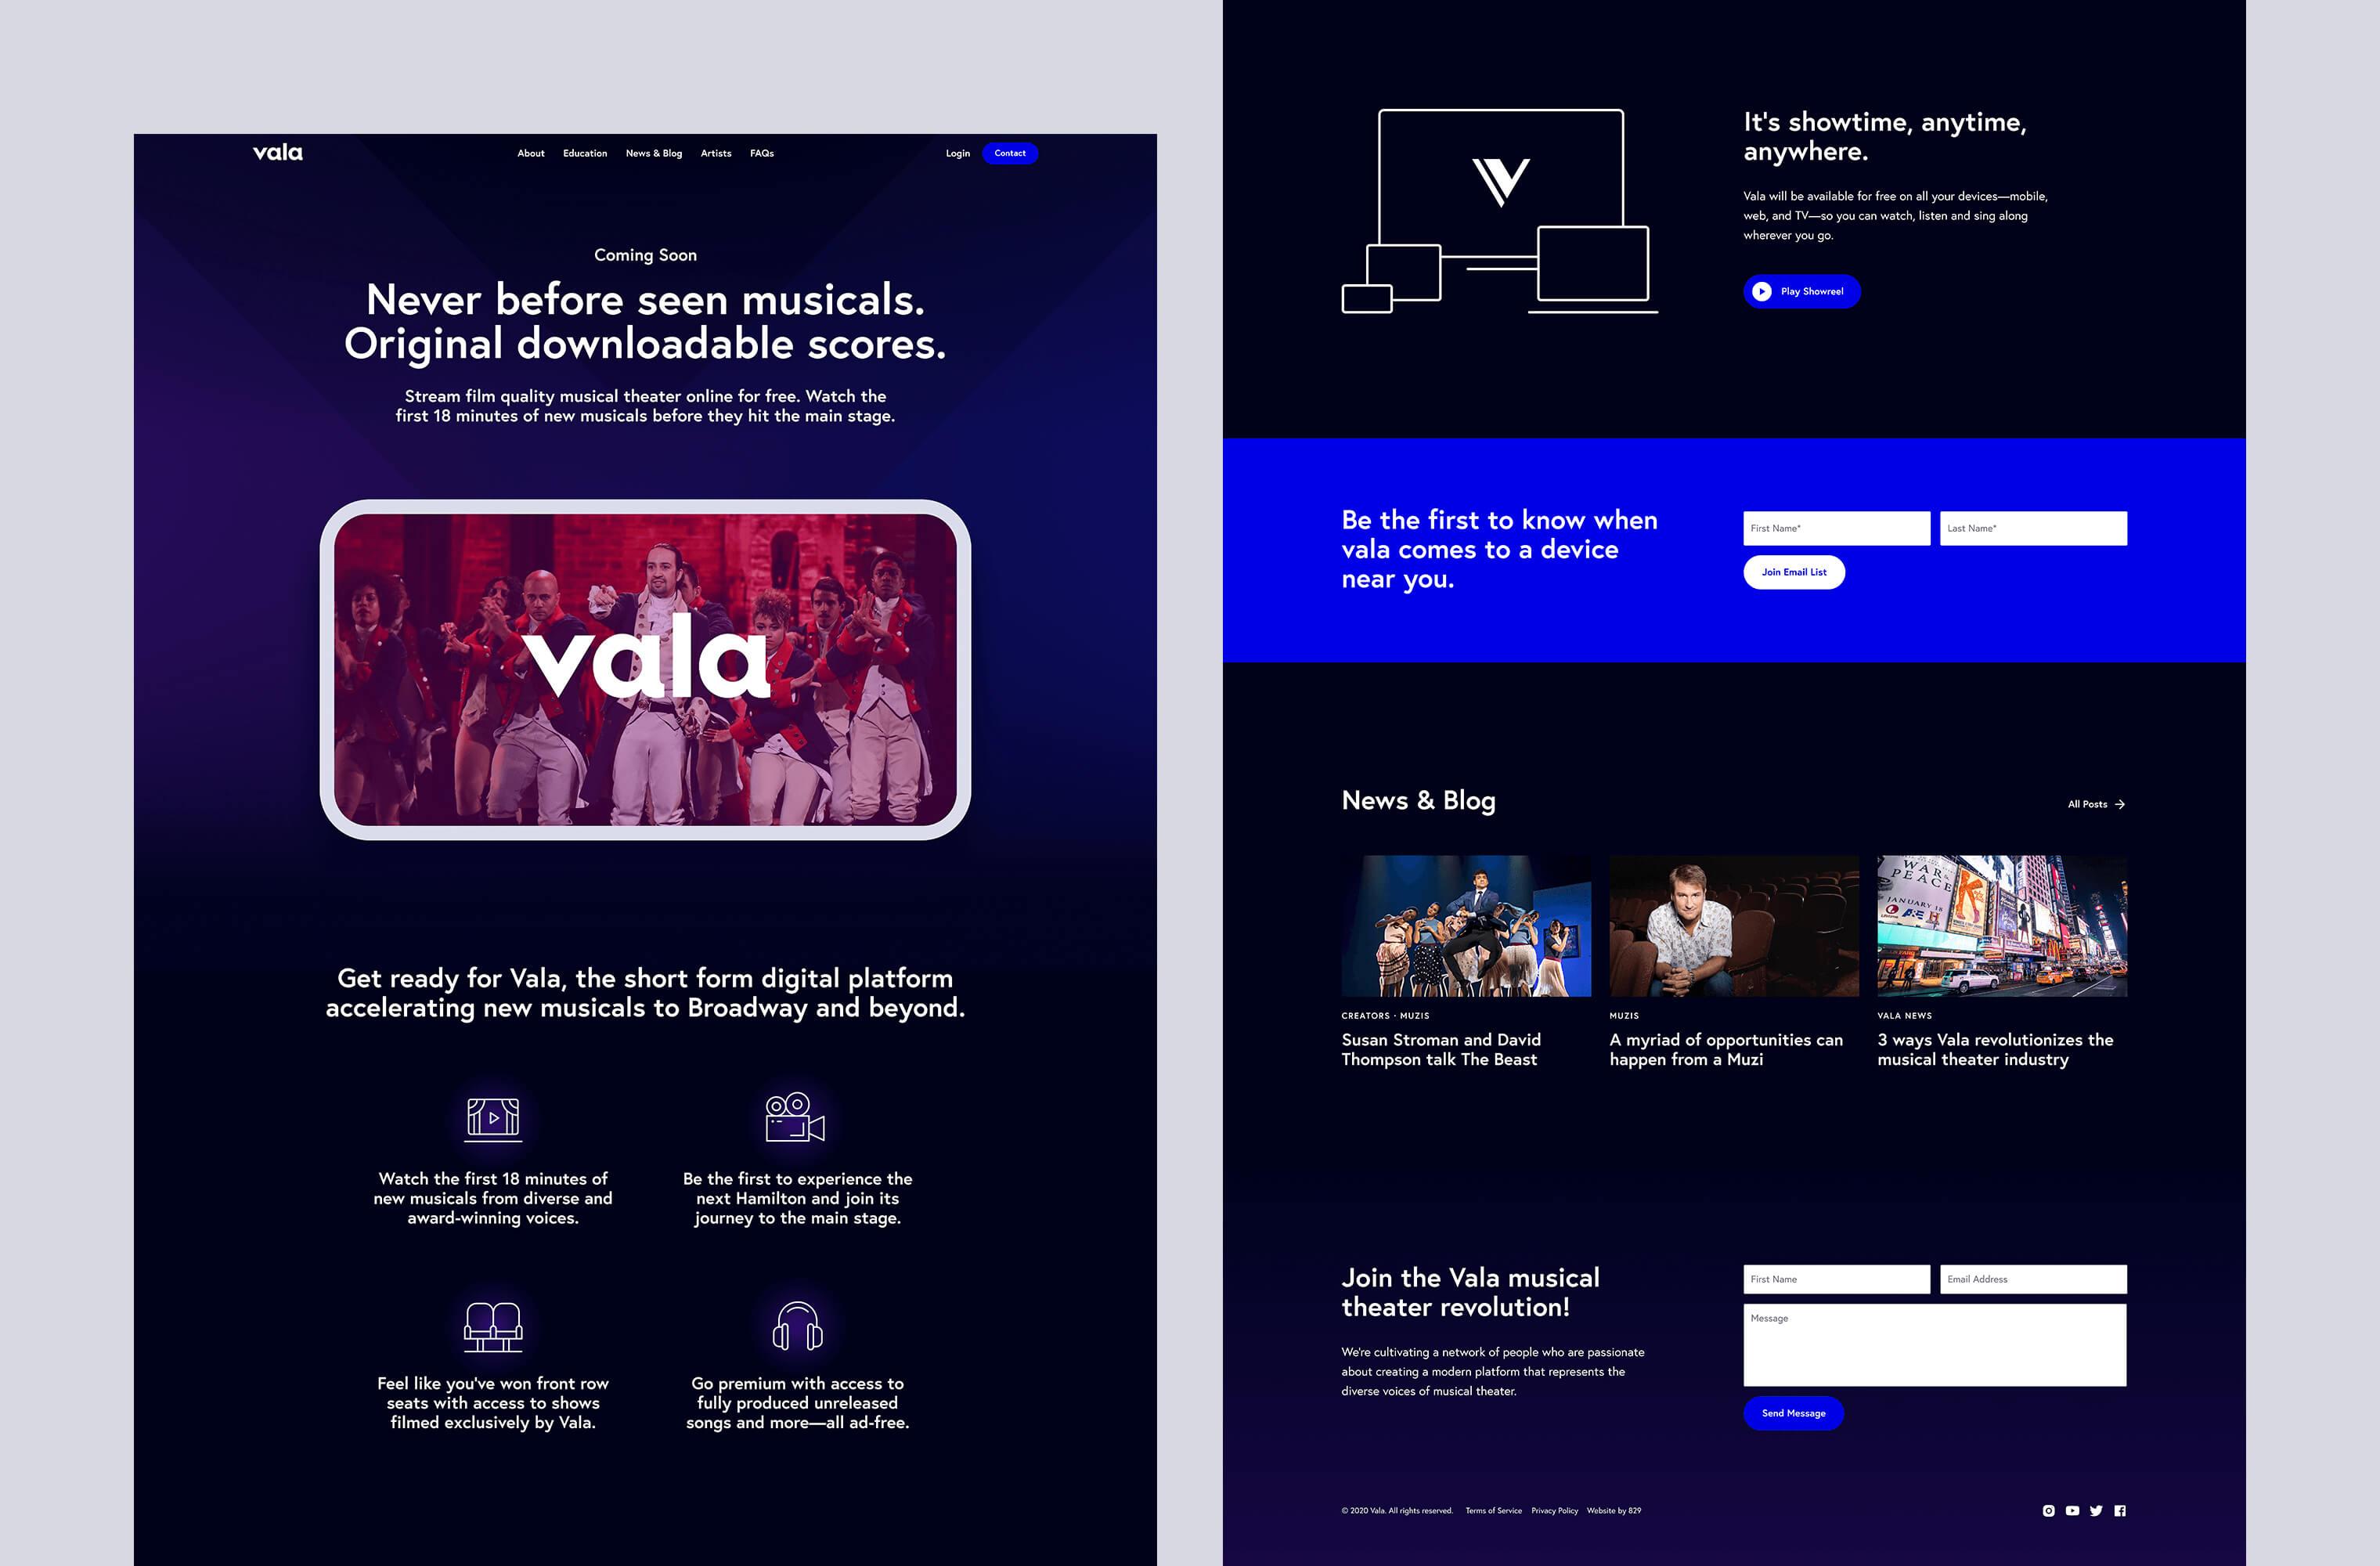 Desktop 'Homepage' for the Vala website